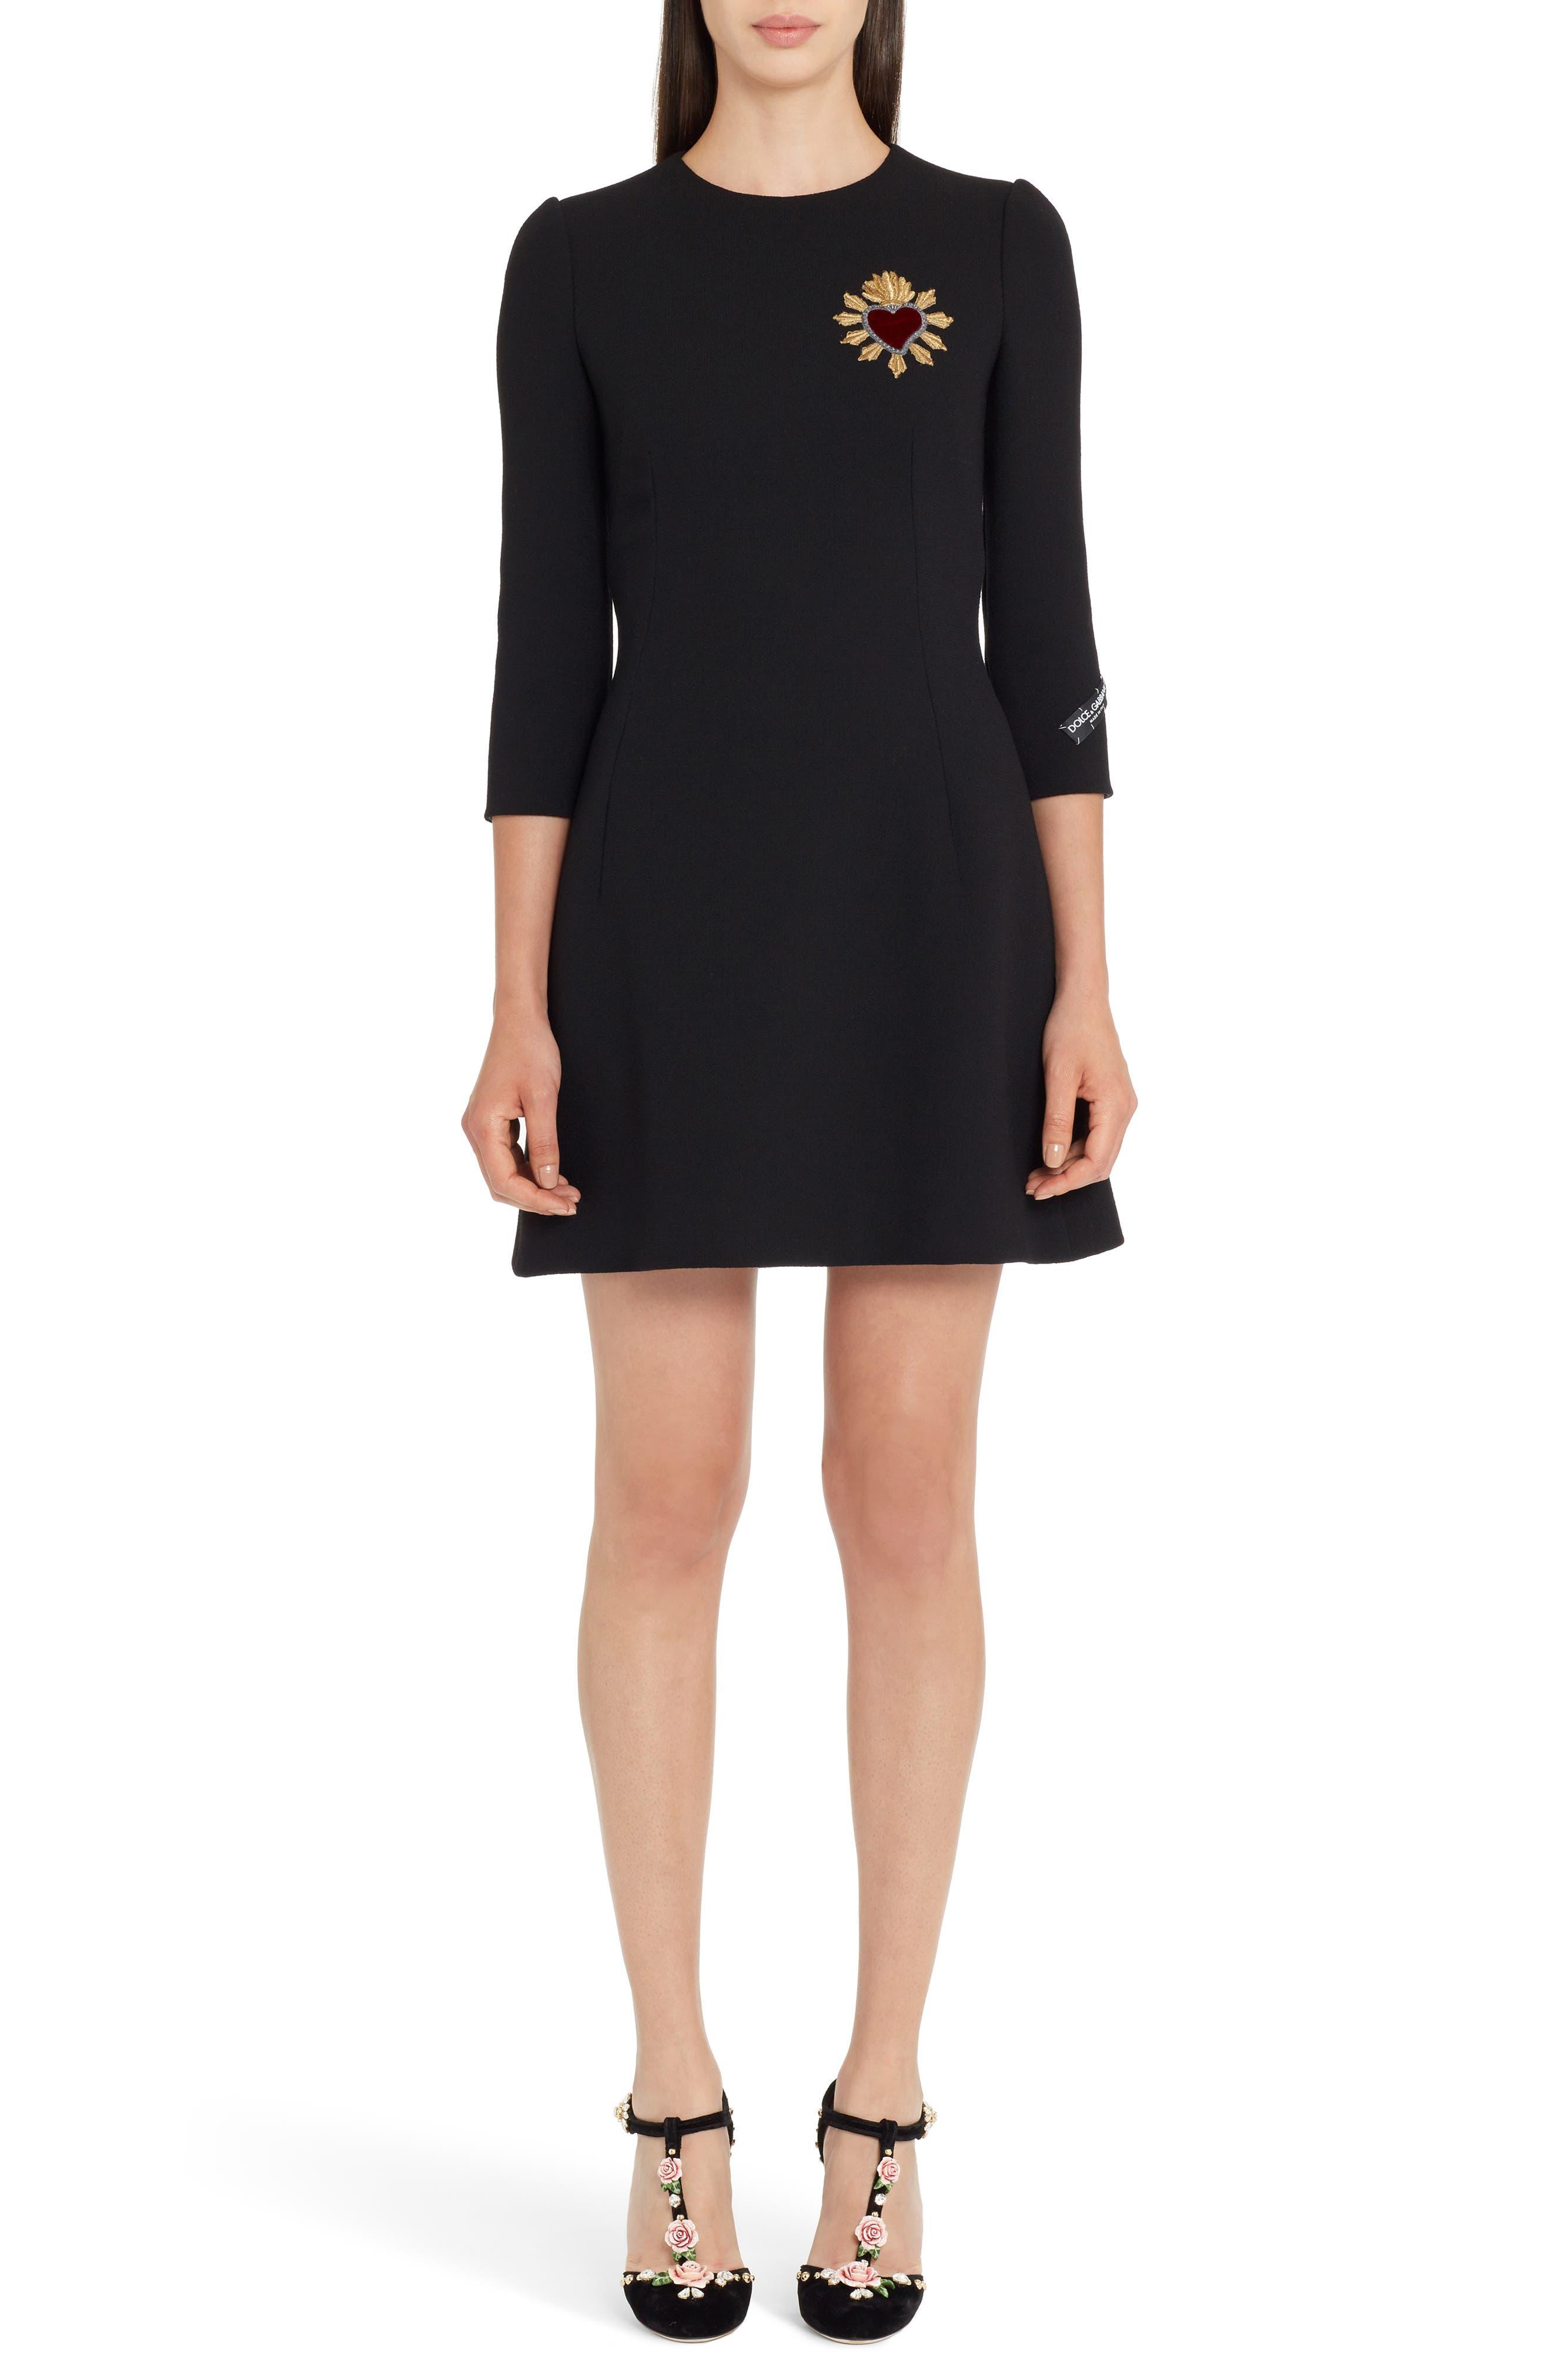 Dolce & gabbana Heart Patch Wool Crepe Dress, US / 42 IT - Black